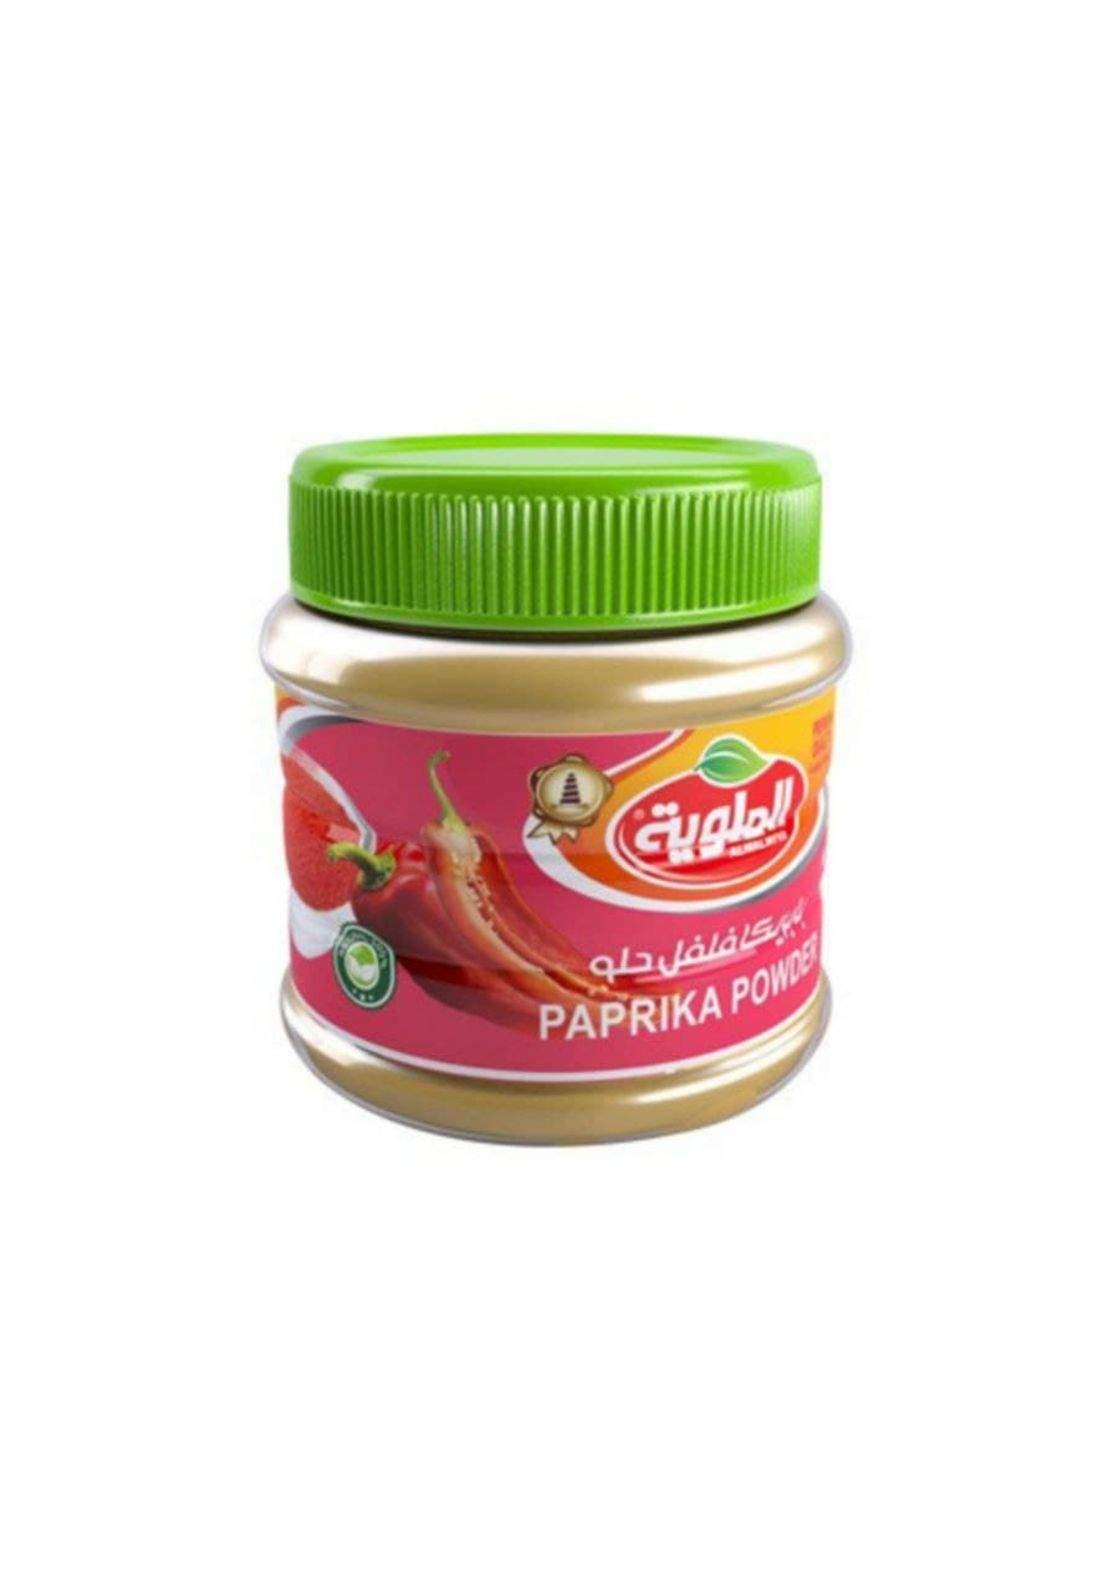 Paprika powder الملوية بابريكا حلوة